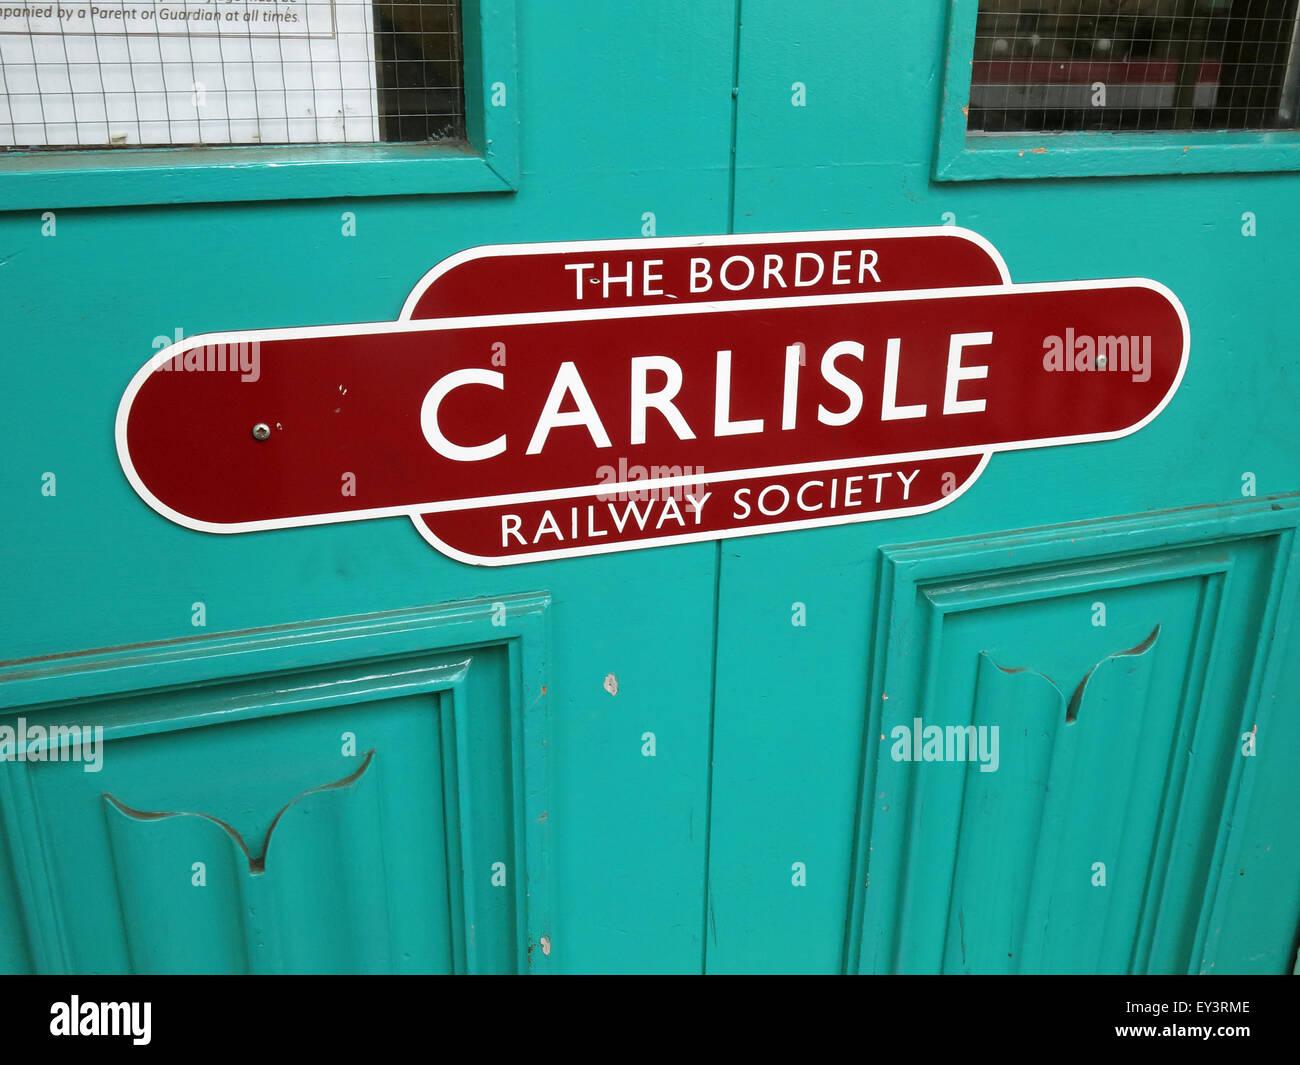 The,Carlisle,Cumbria,England,UK,GB,great,Britain,door,doorway,00,scale,00 scale,model,train,trains,member,members,club,platform,three,Citadel,station,borderrailwaysociety,www.borderrailway.org,Border Railway society,Great Britain,model railway,model trains,Platform 3,Citadel station,GoTonySmith,http,//www.borderrailwaysociety.org,Buy Pictures of,Buy Images Of